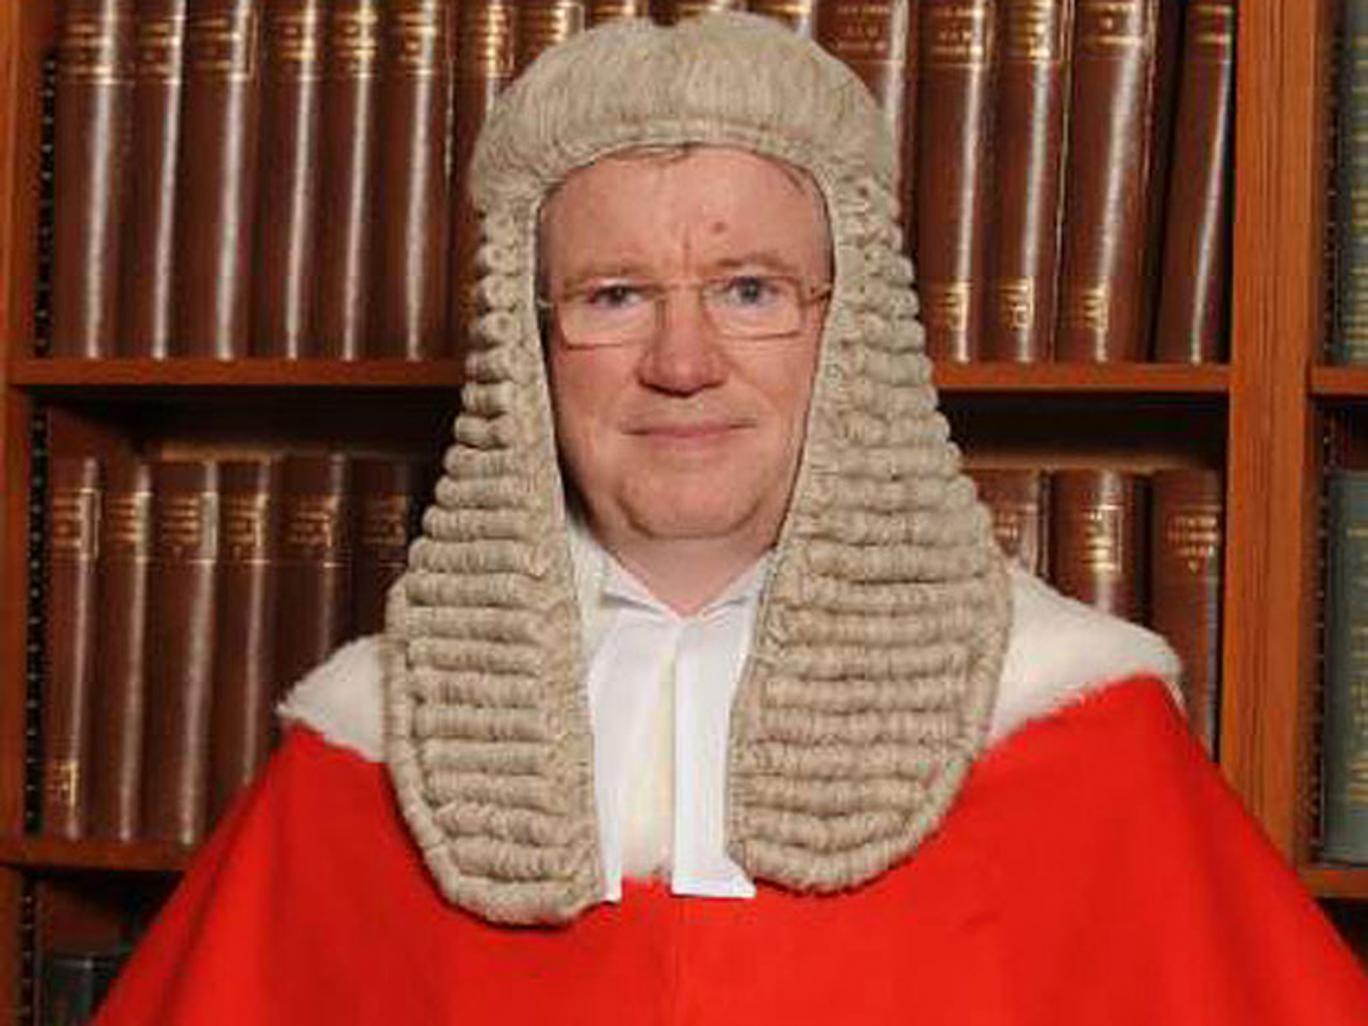 Mr Justice Sweeney